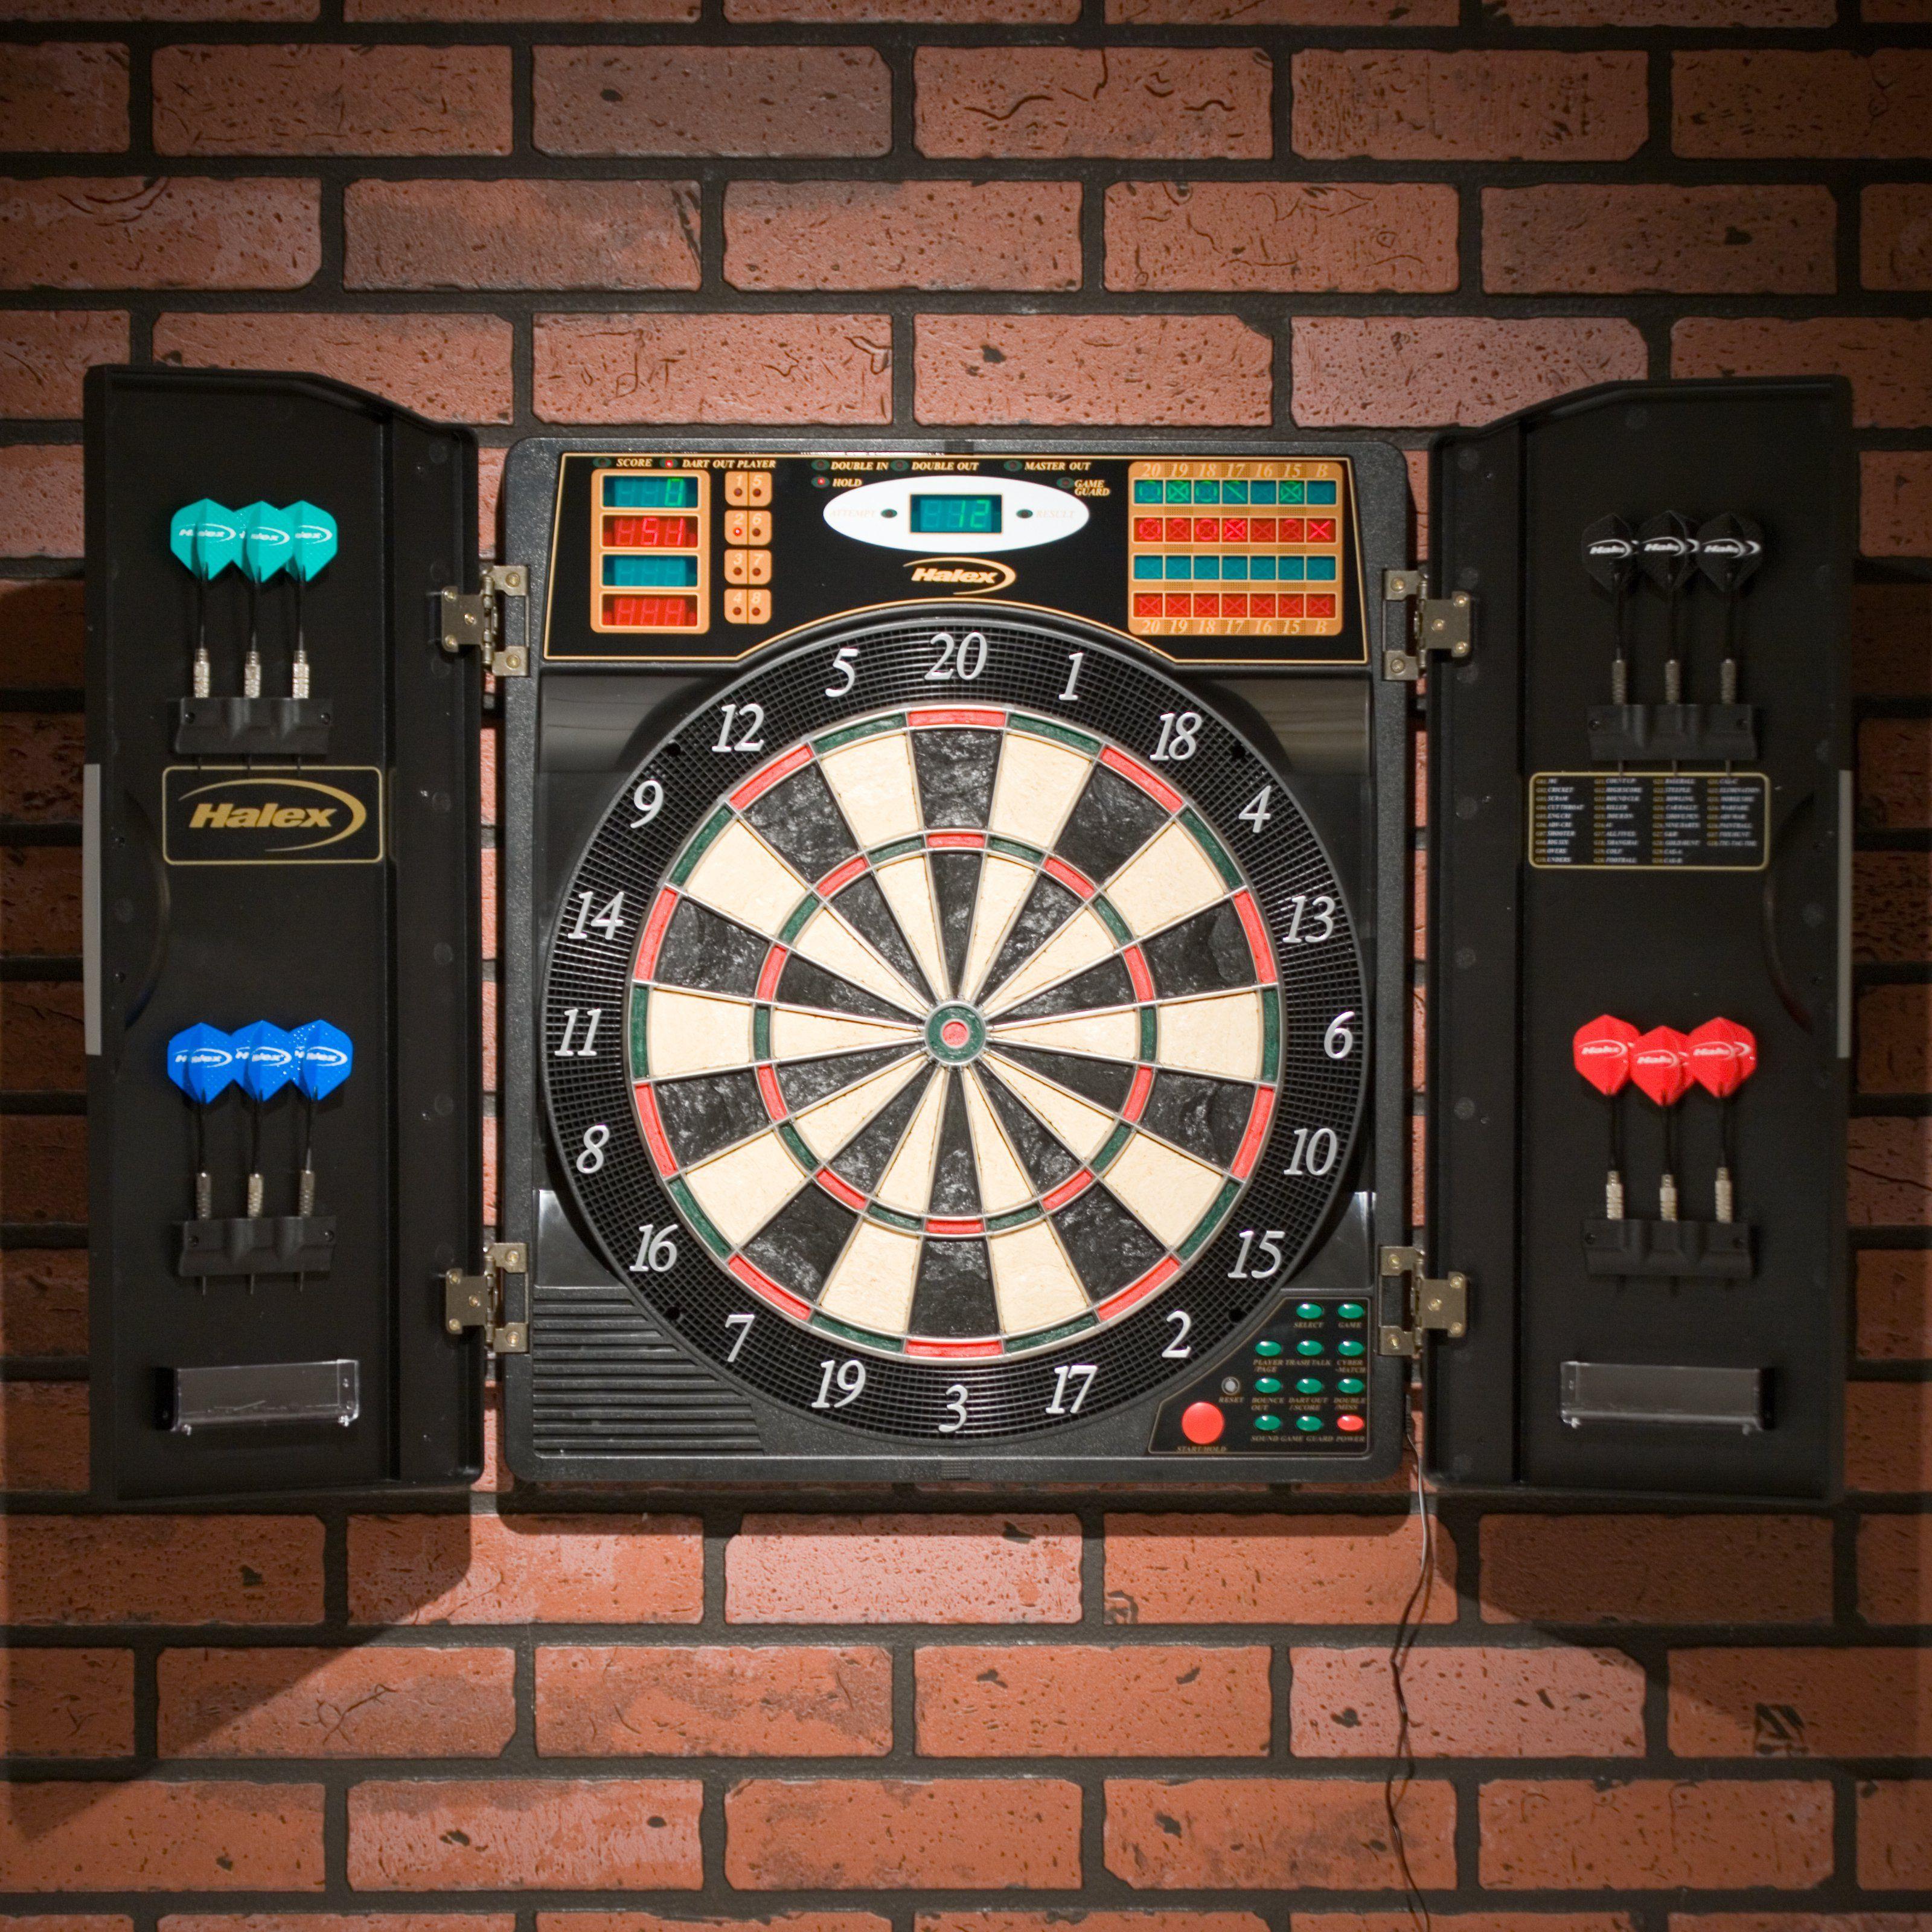 Have To Have It Halex Madison Bristletech Electronic Dart